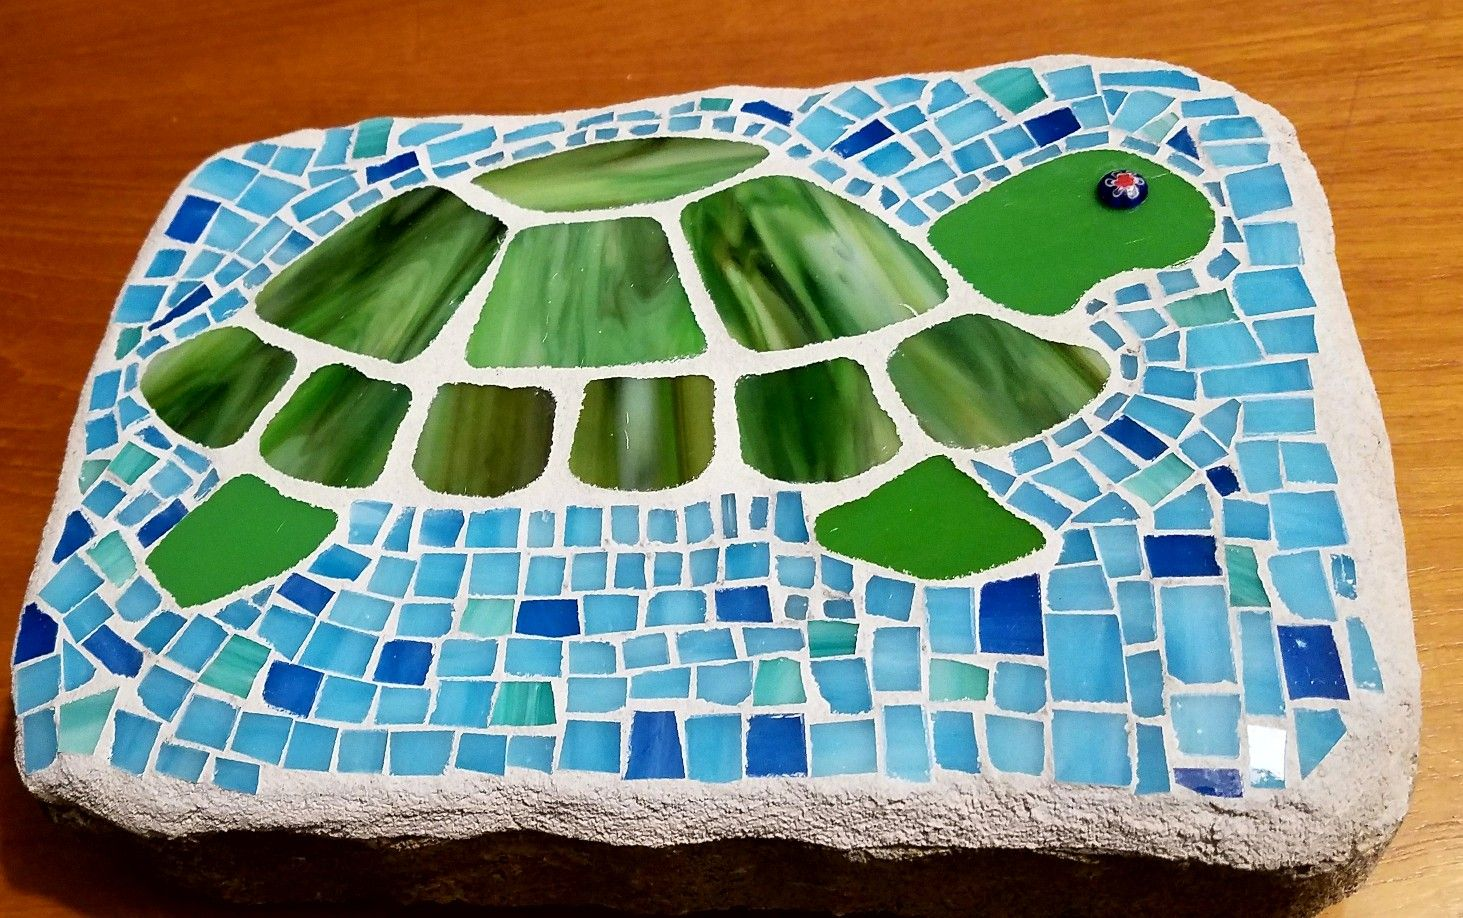 Turtle mosaic garden stone J DeVore Creations | mosaic3 | Pinterest ...